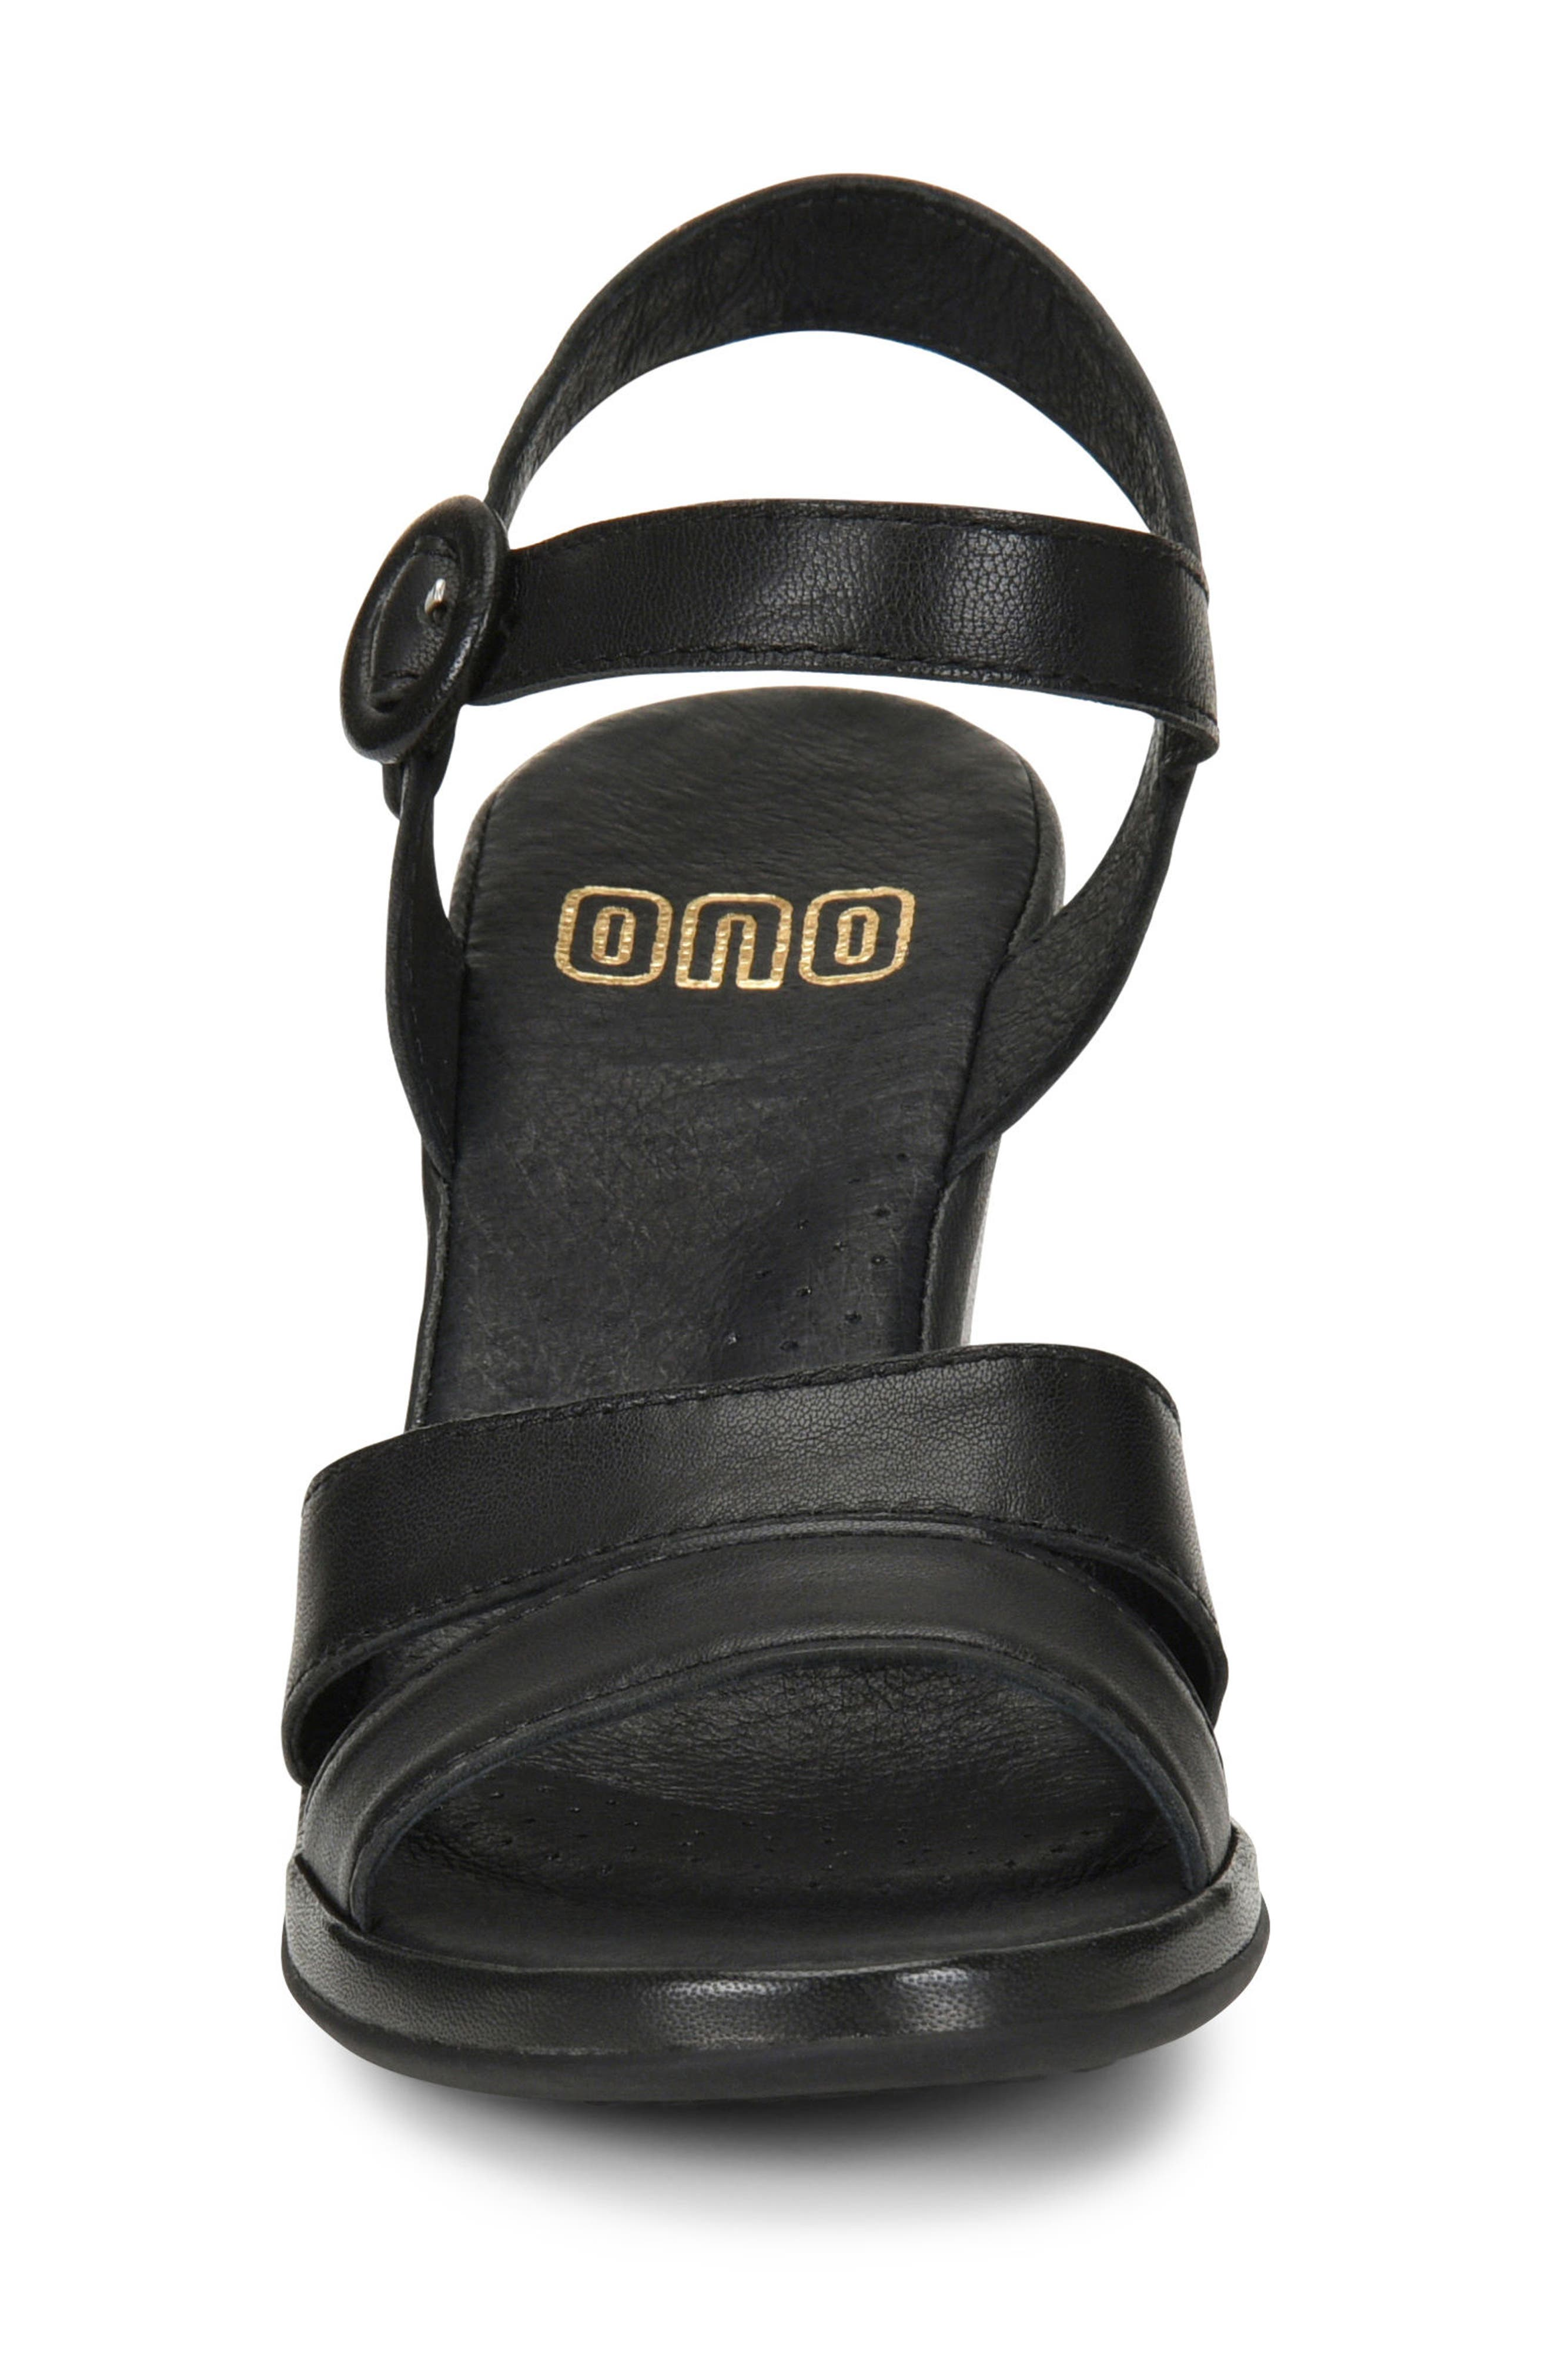 Hydro Wedge Sandal,                             Alternate thumbnail 5, color,                             Black Leather